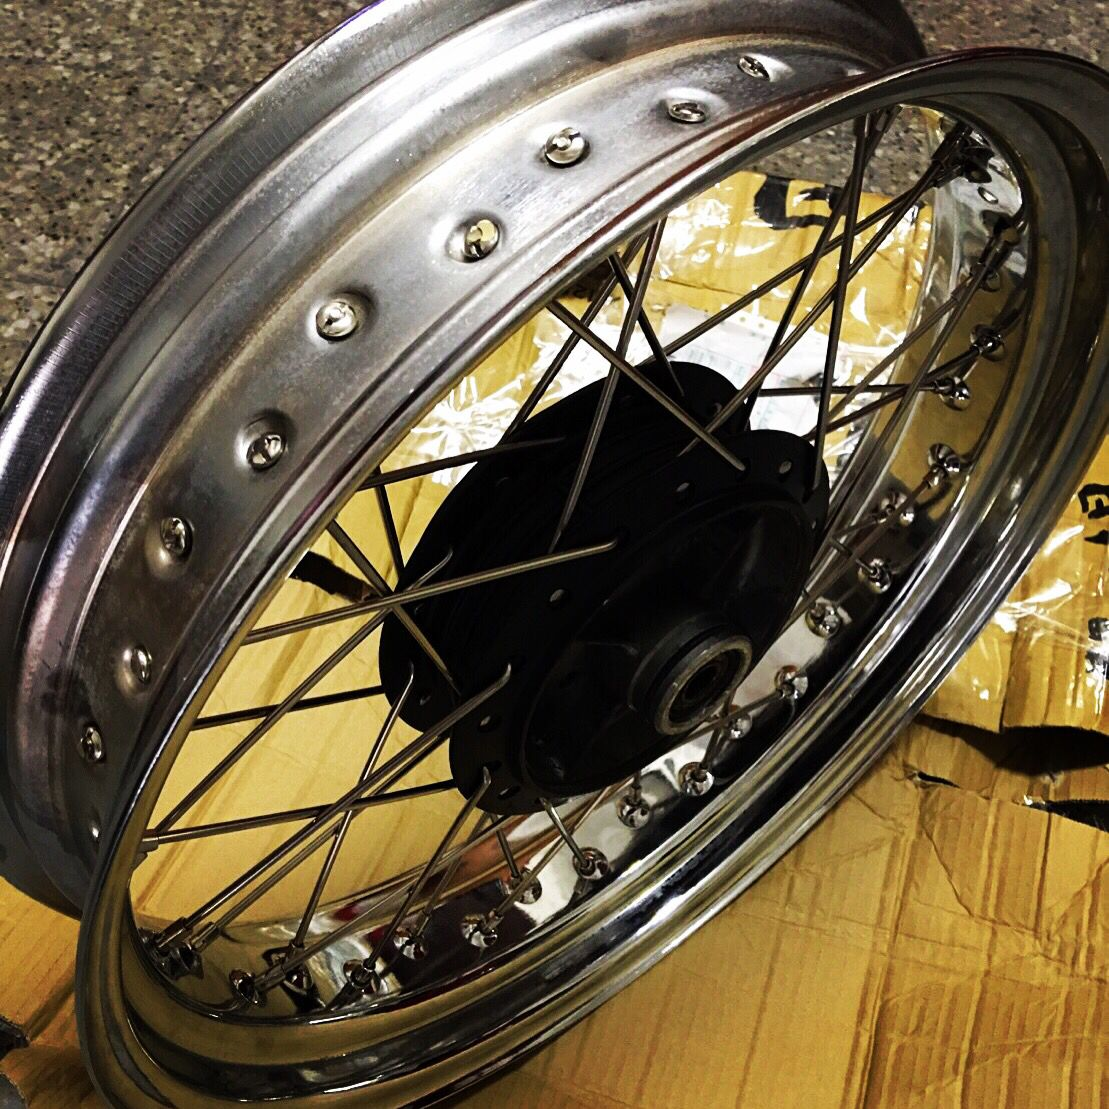 Motorcycle spoke size chart yarta. Innovations2019. Org.